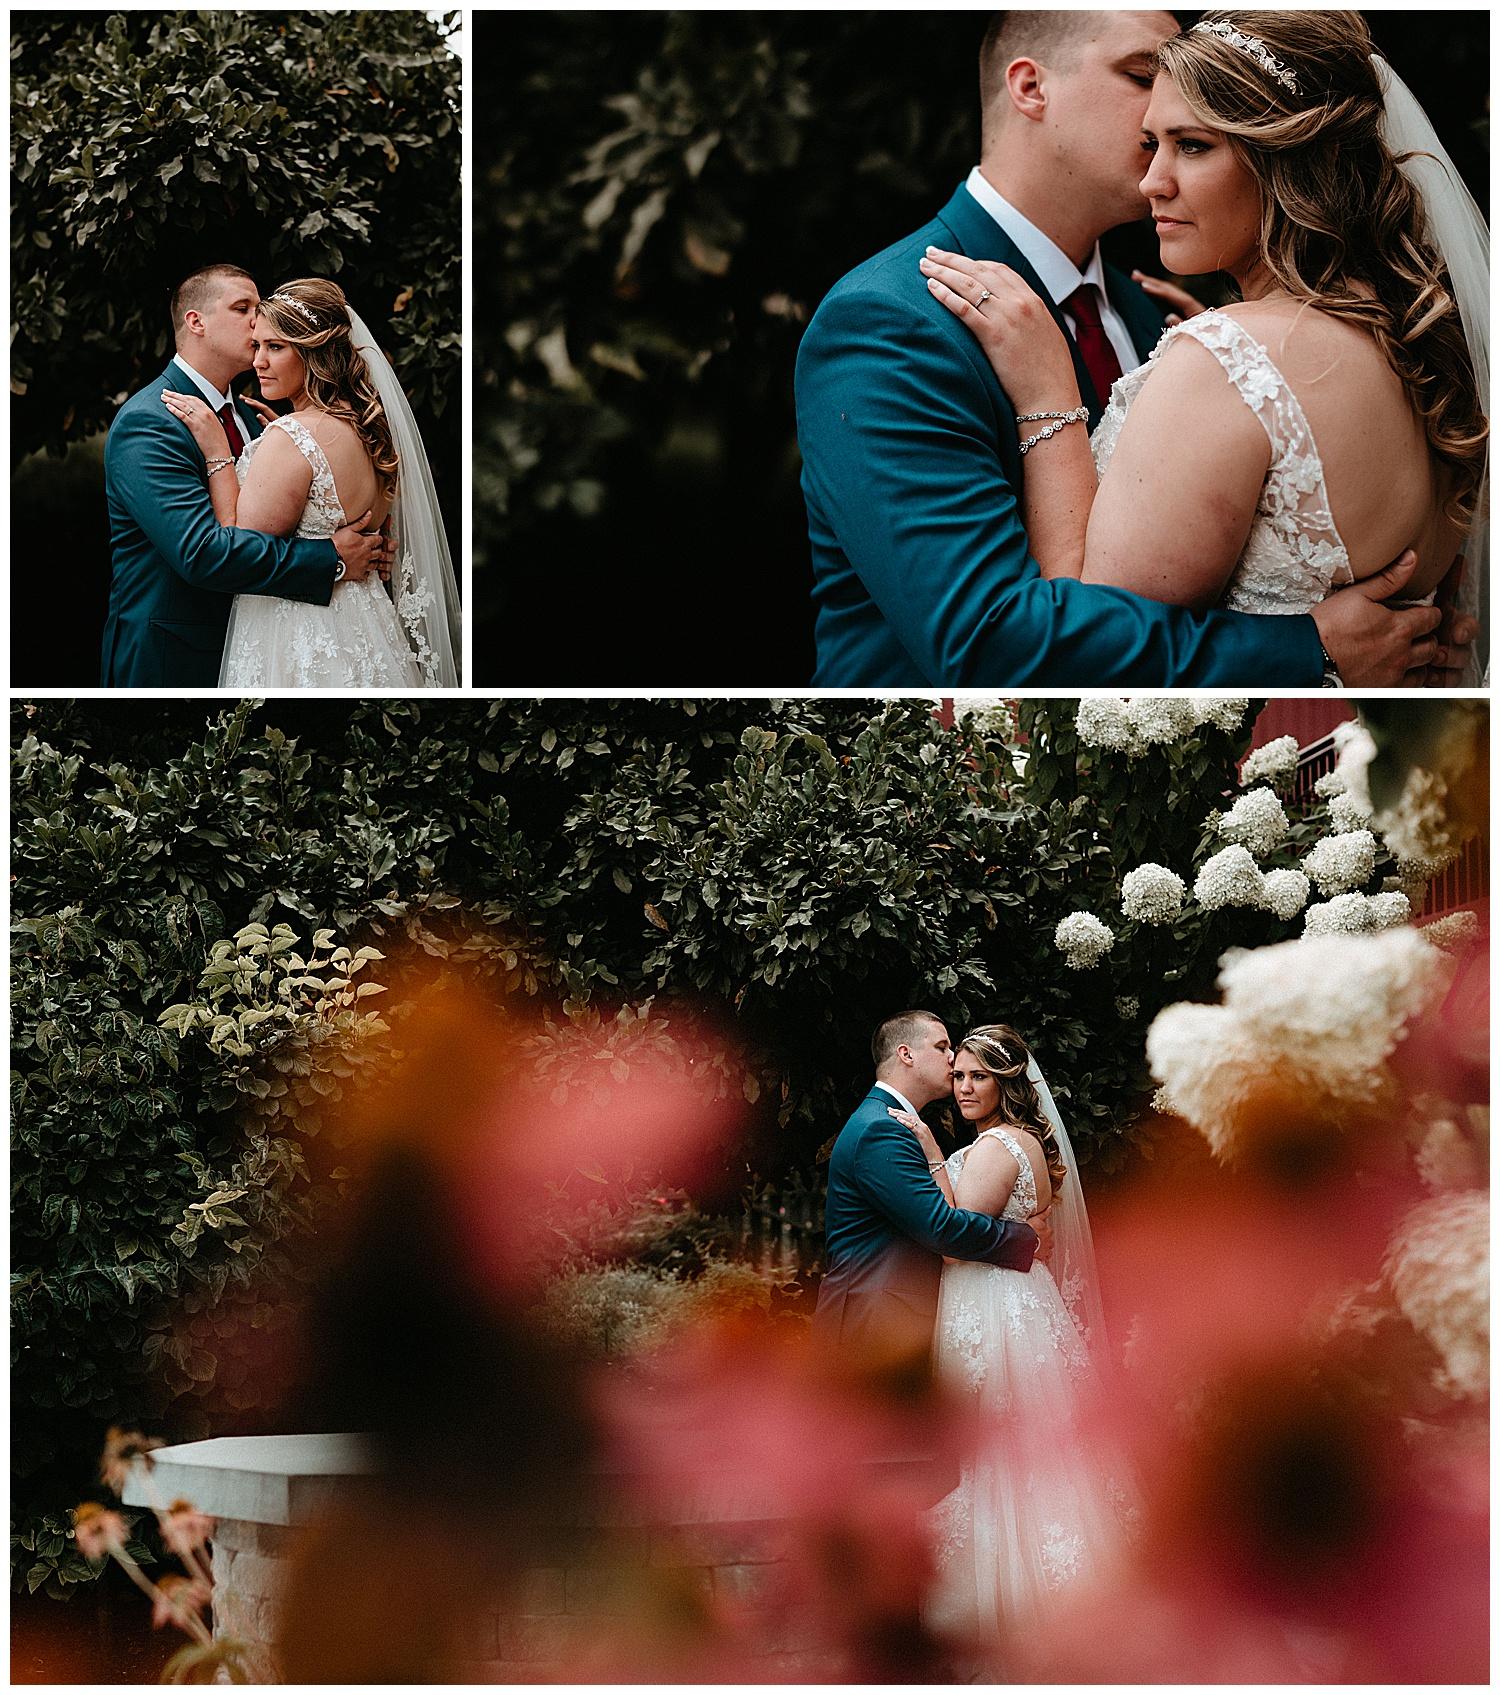 NEPA-Bloomgsburg-Wedding-Photographer-at-The-Barn-at-Greystone-Farms-Watsontown-PA_0037.jpg